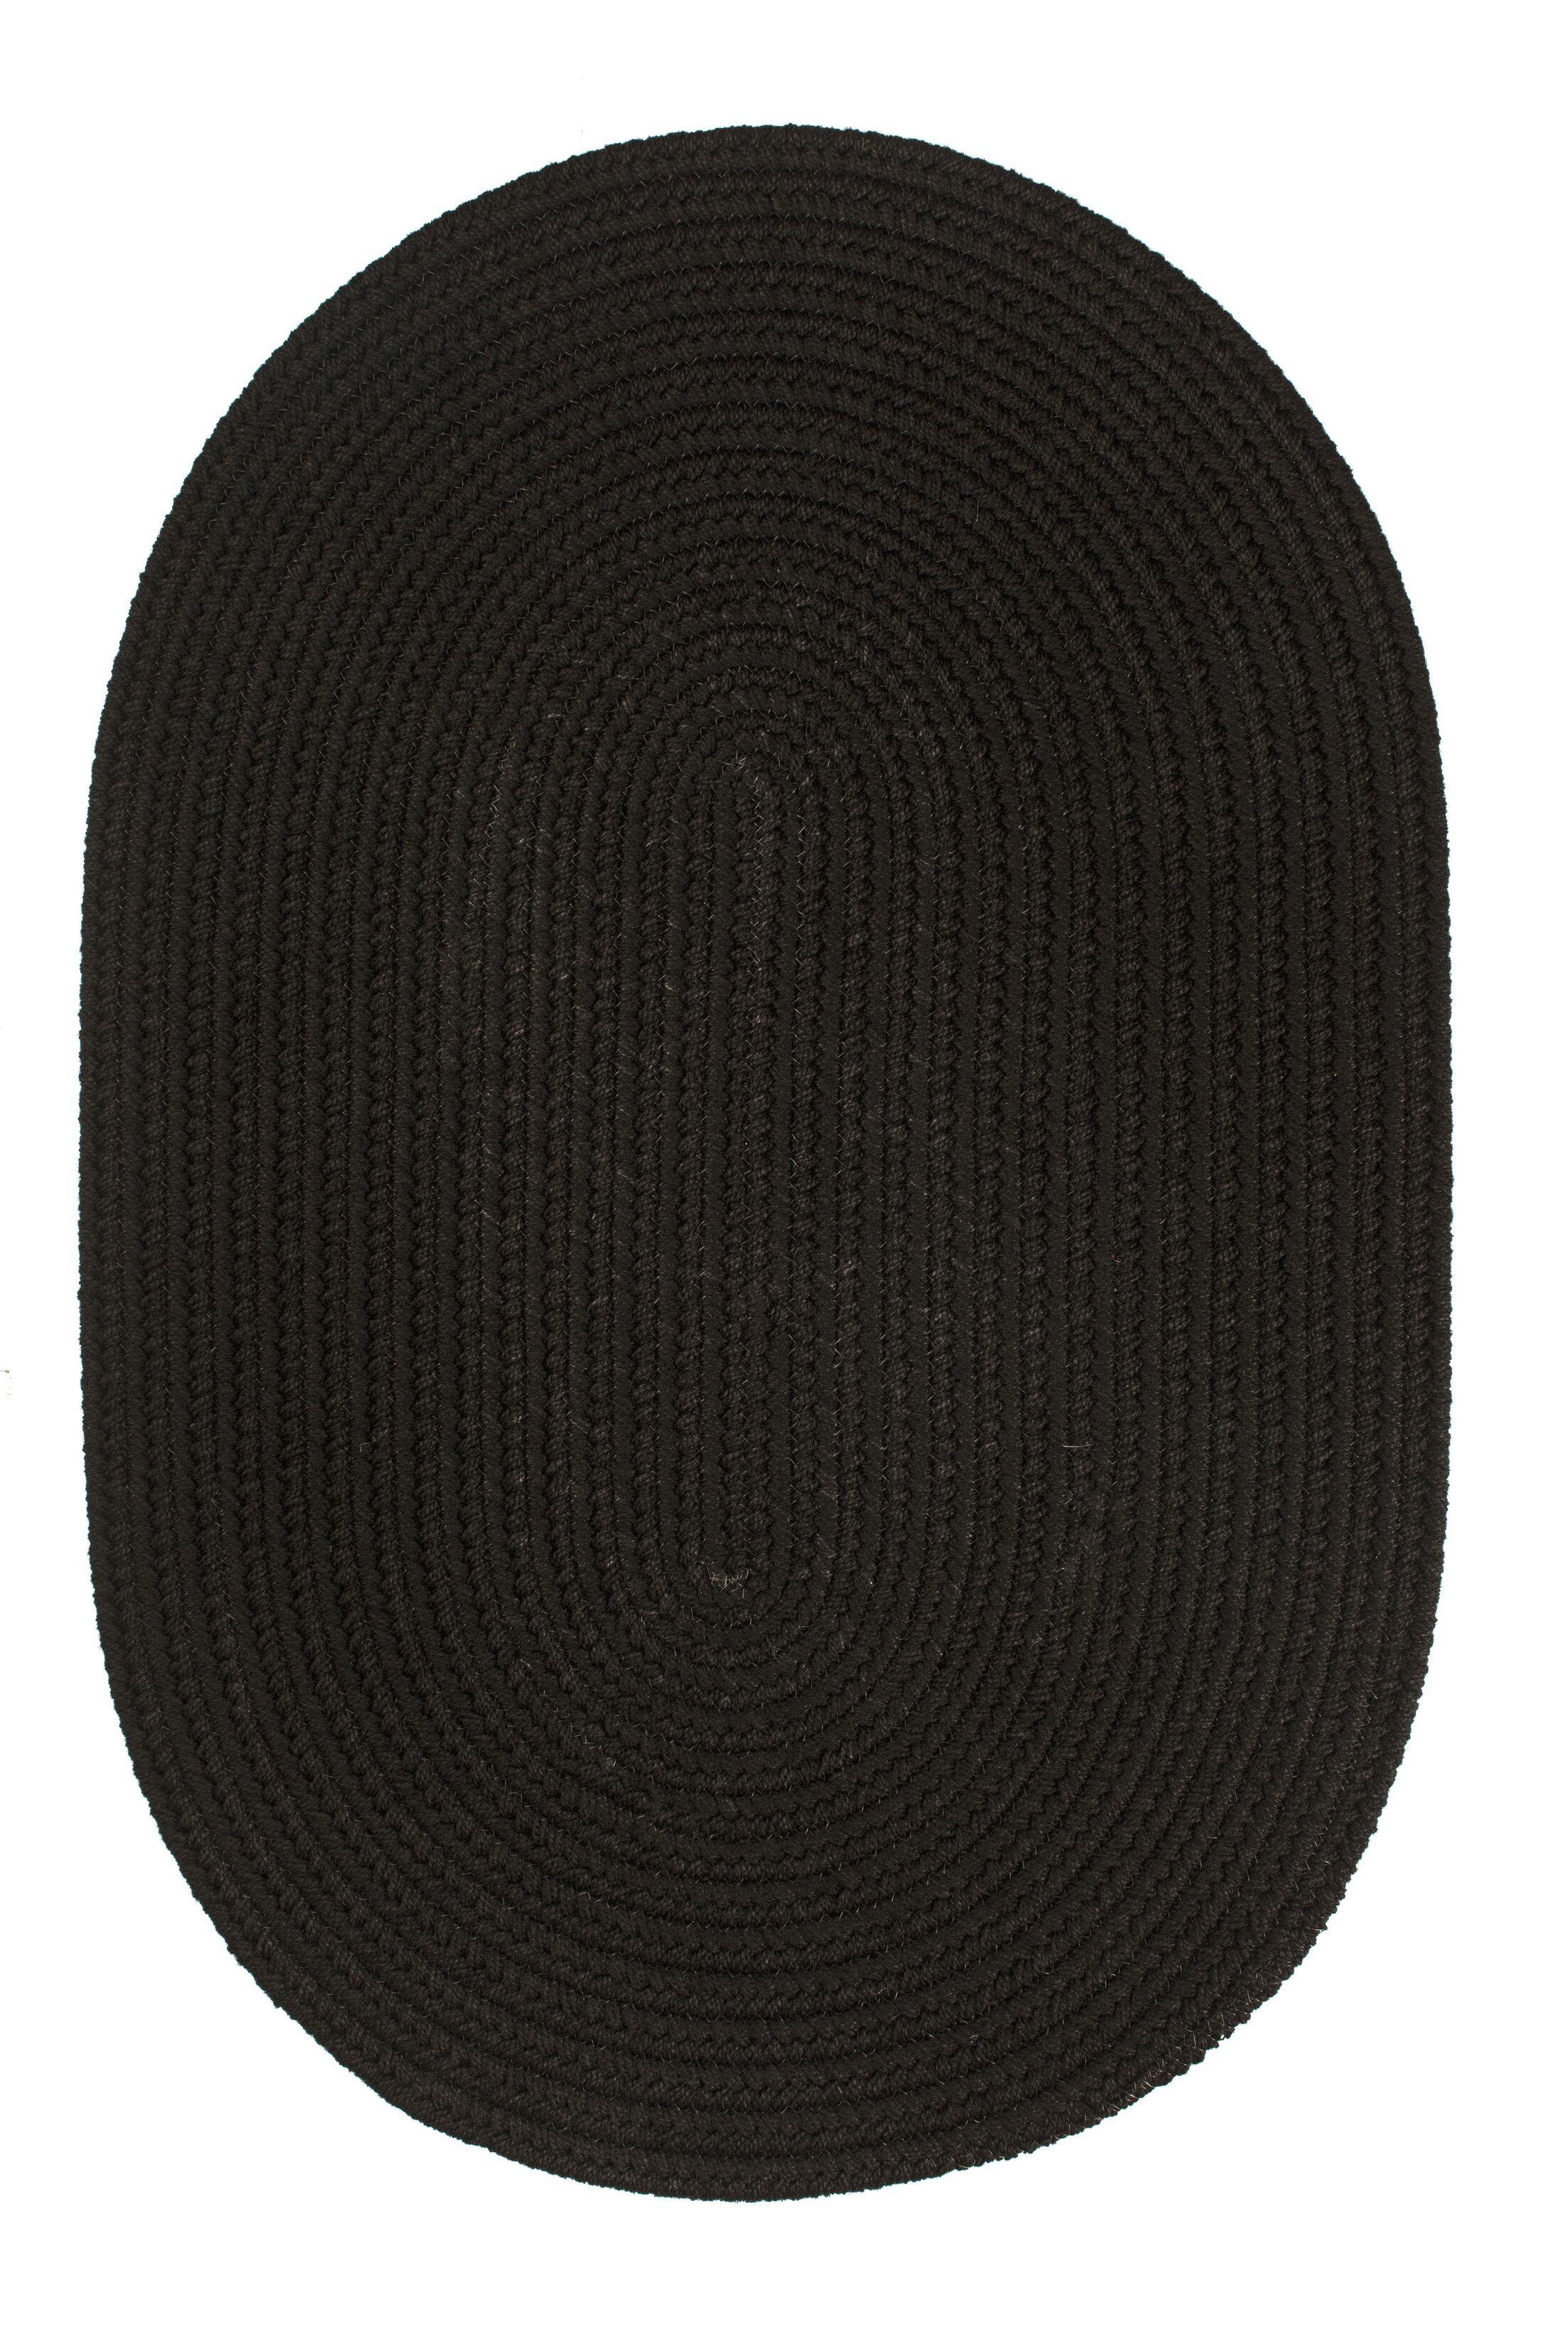 Handmade Black Indoor/Outdoor Area Rug Rug Size: Oval 4' x 6'